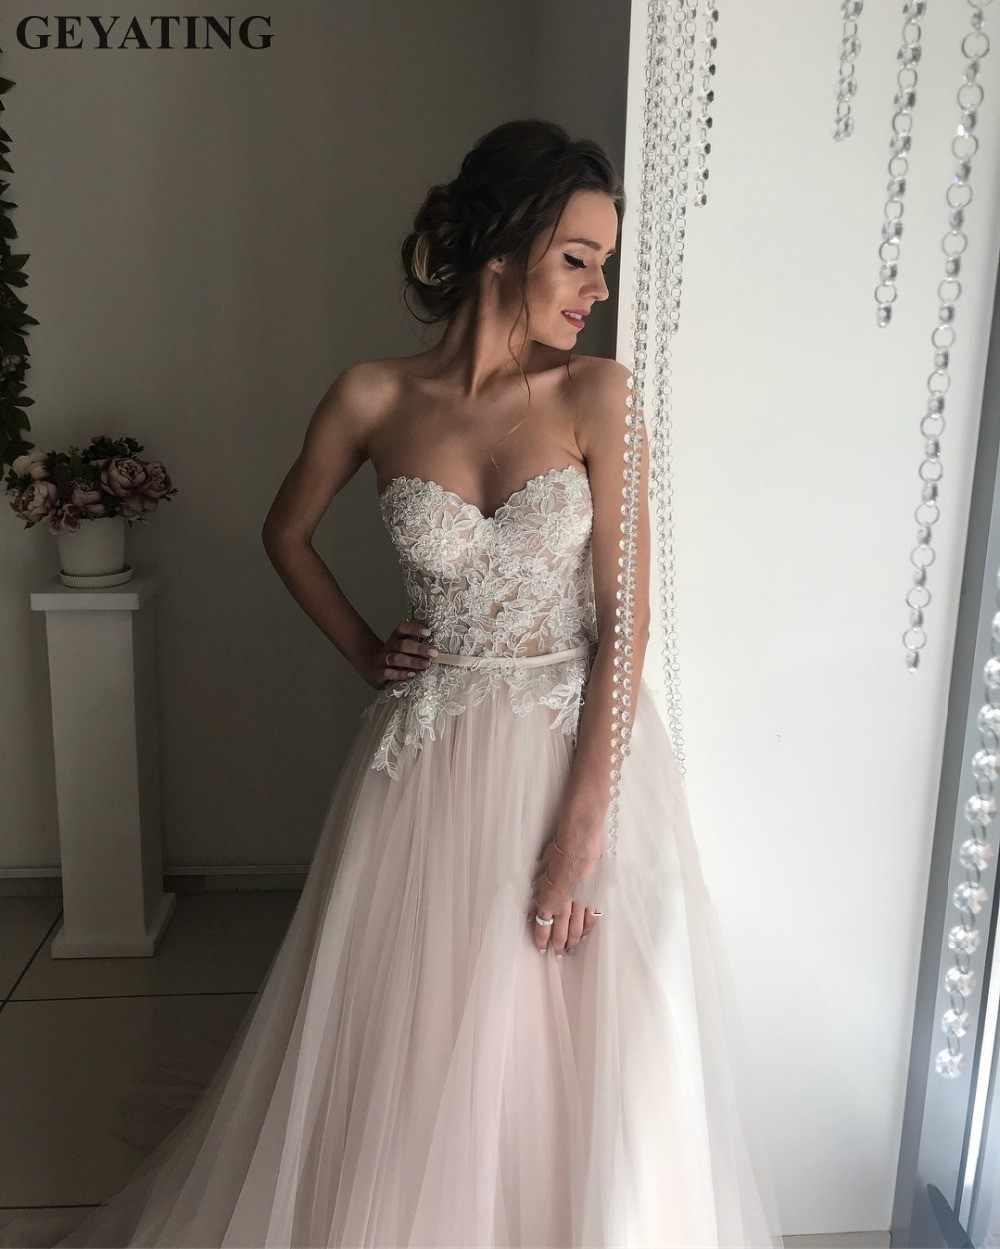 7fae4cf067da ... Blush Pink Tulle Wedding Dress 2019 Elegant Appliqued Lace Sweetheart  Sweep Train Cheap Wedding Gowns A ...